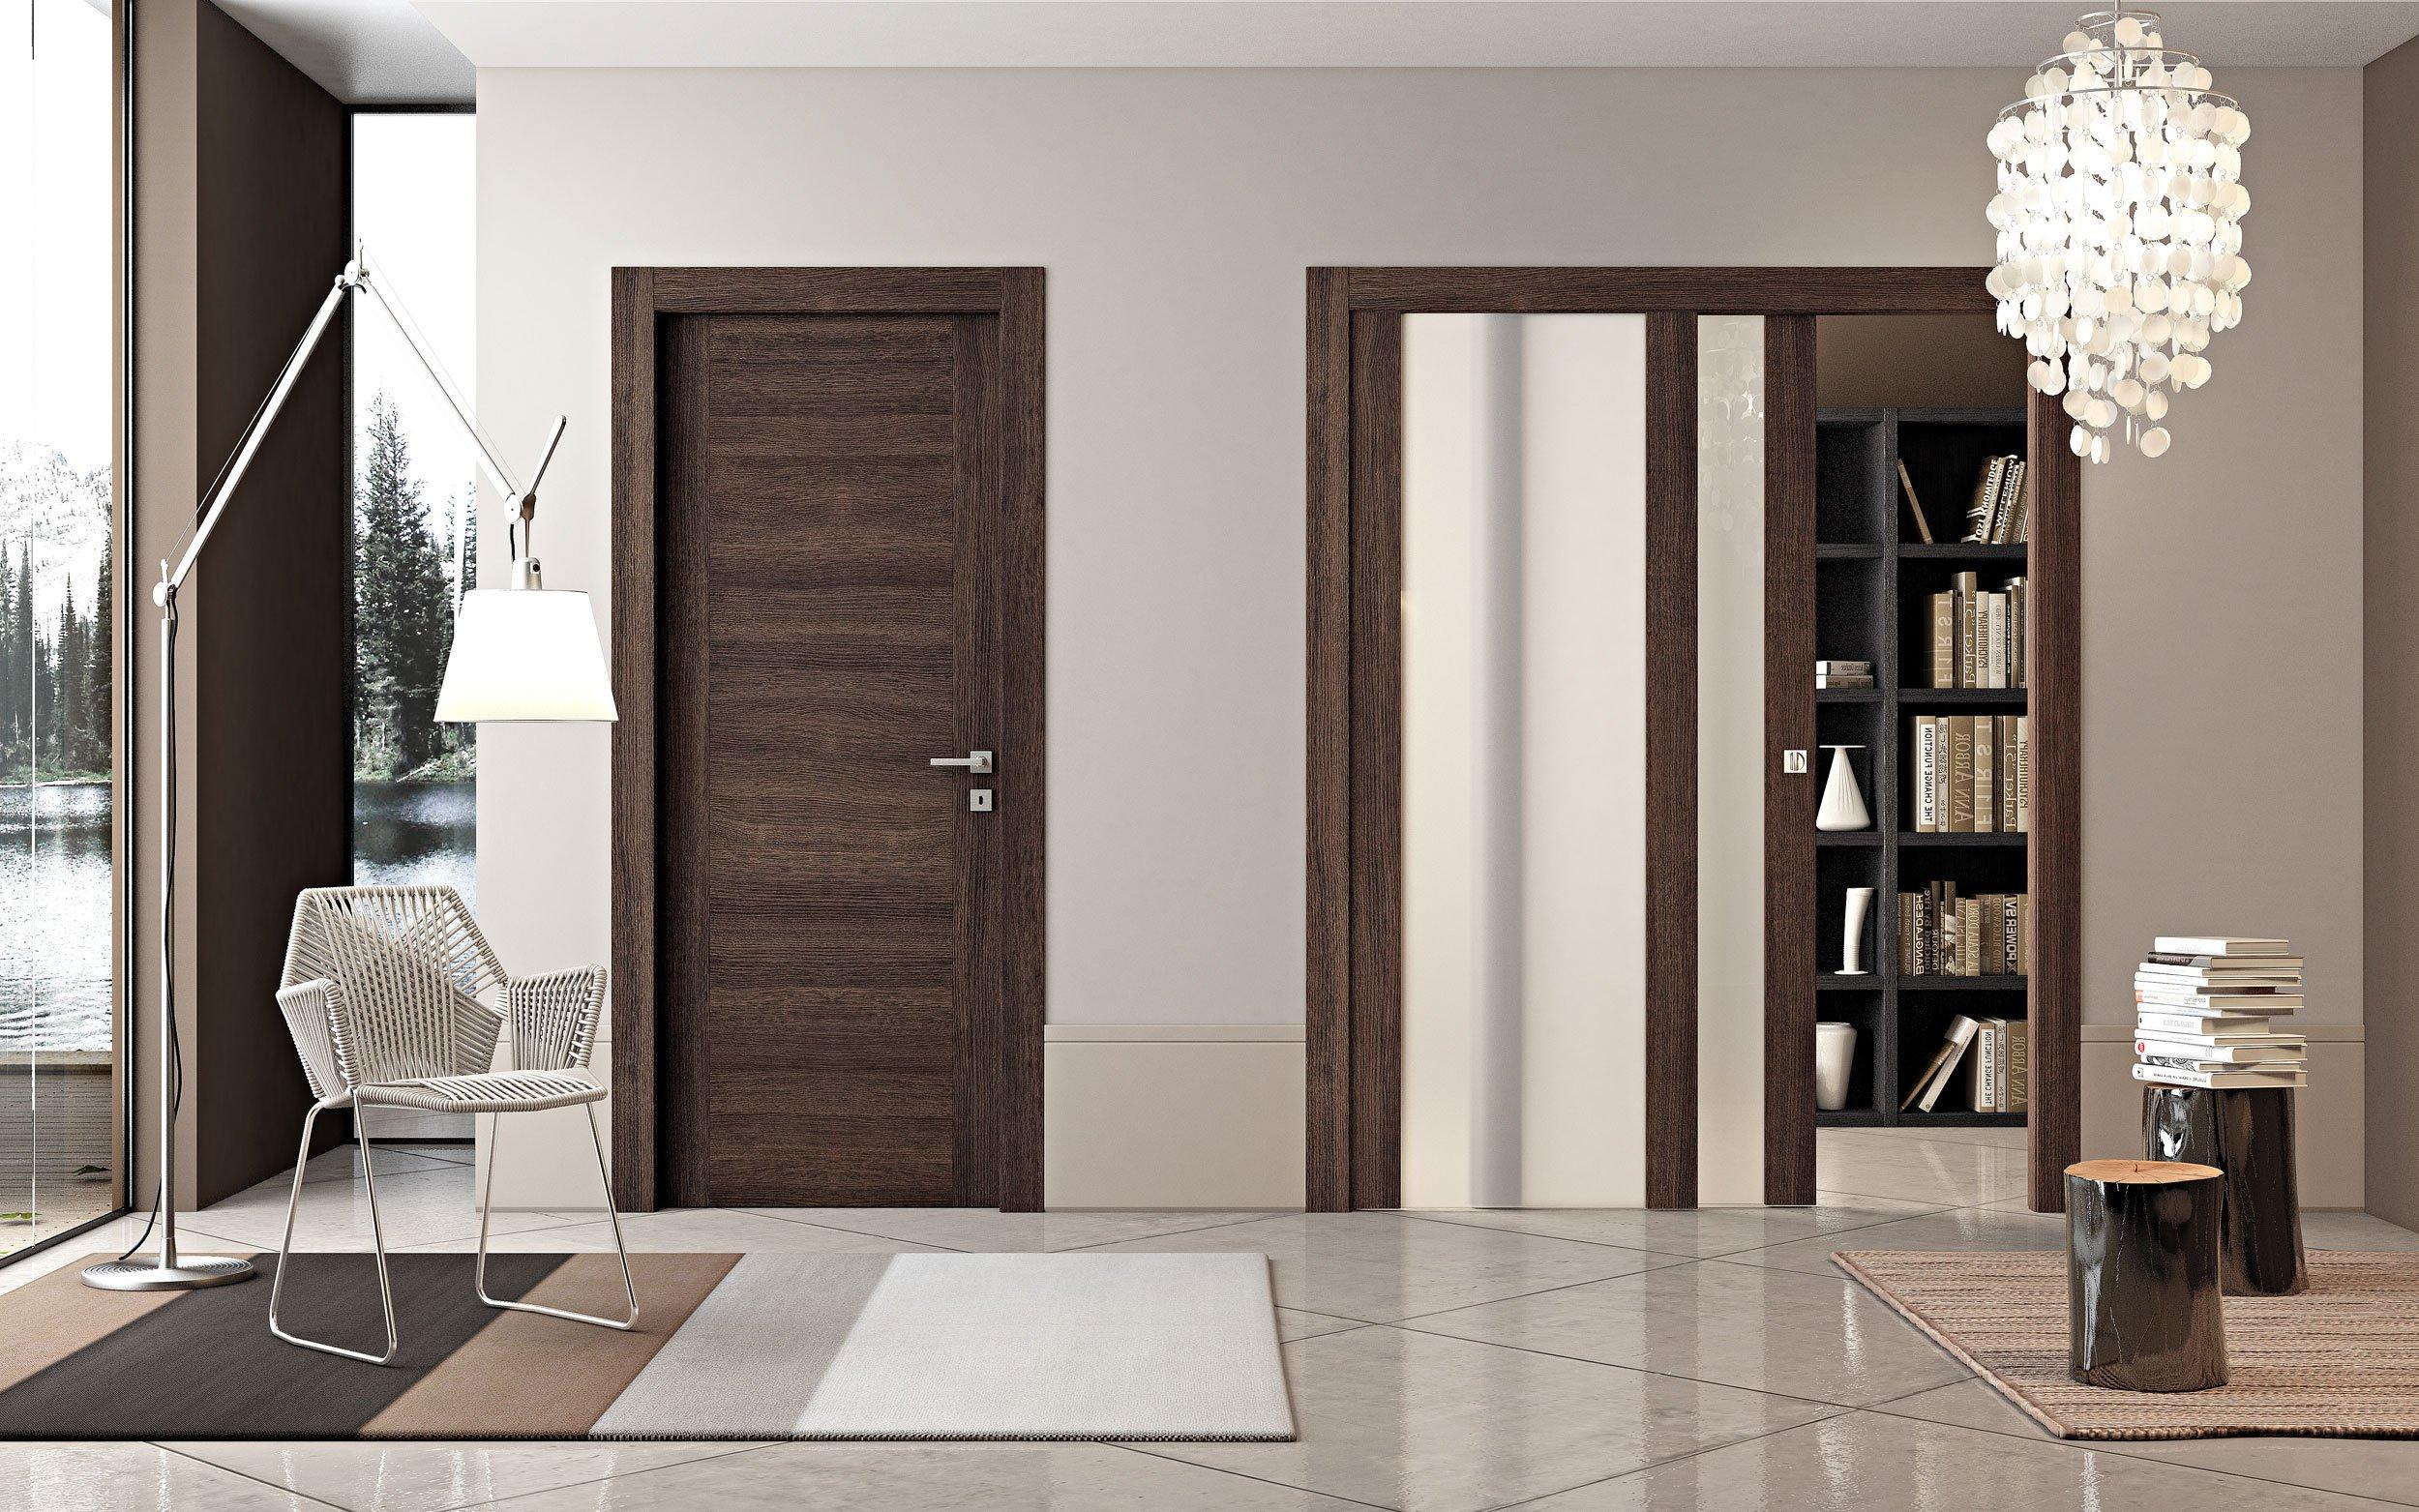 035_alisea-geo-08-cieca-telaio-design-2015alisea-geo-08-vetro-simmetrico- Home